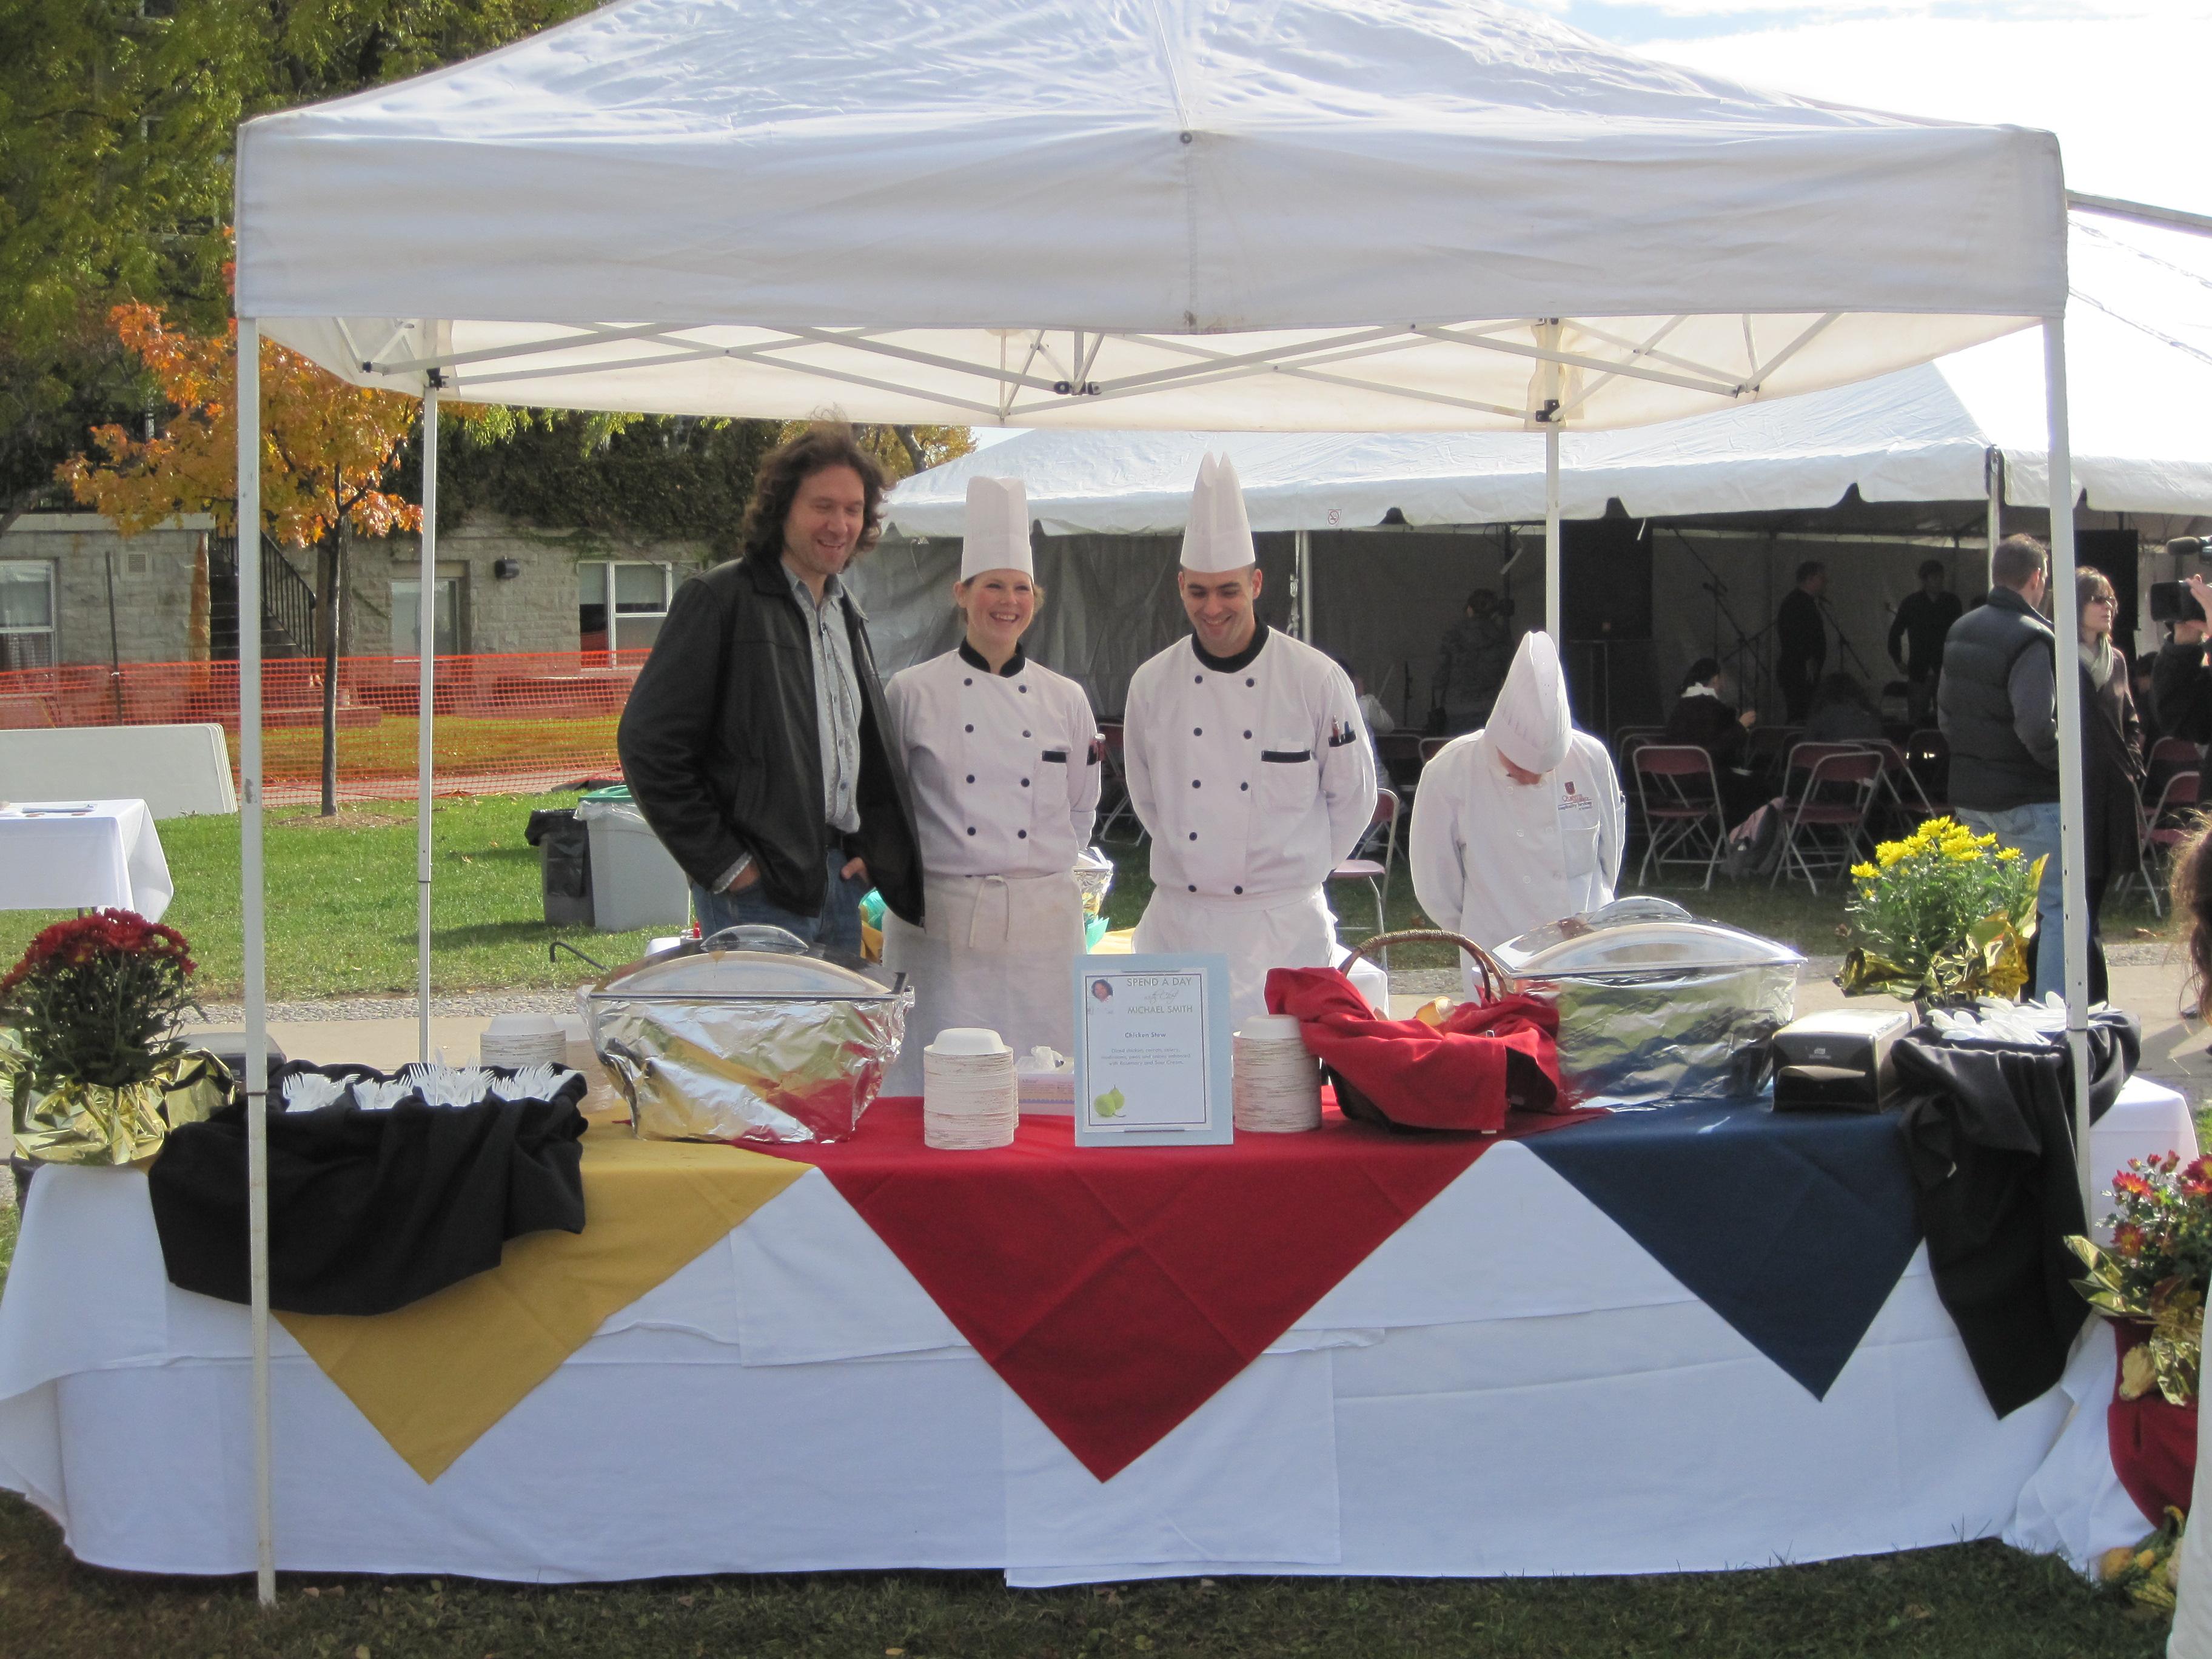 Chef Garden: Meeting Chef Michael Smith